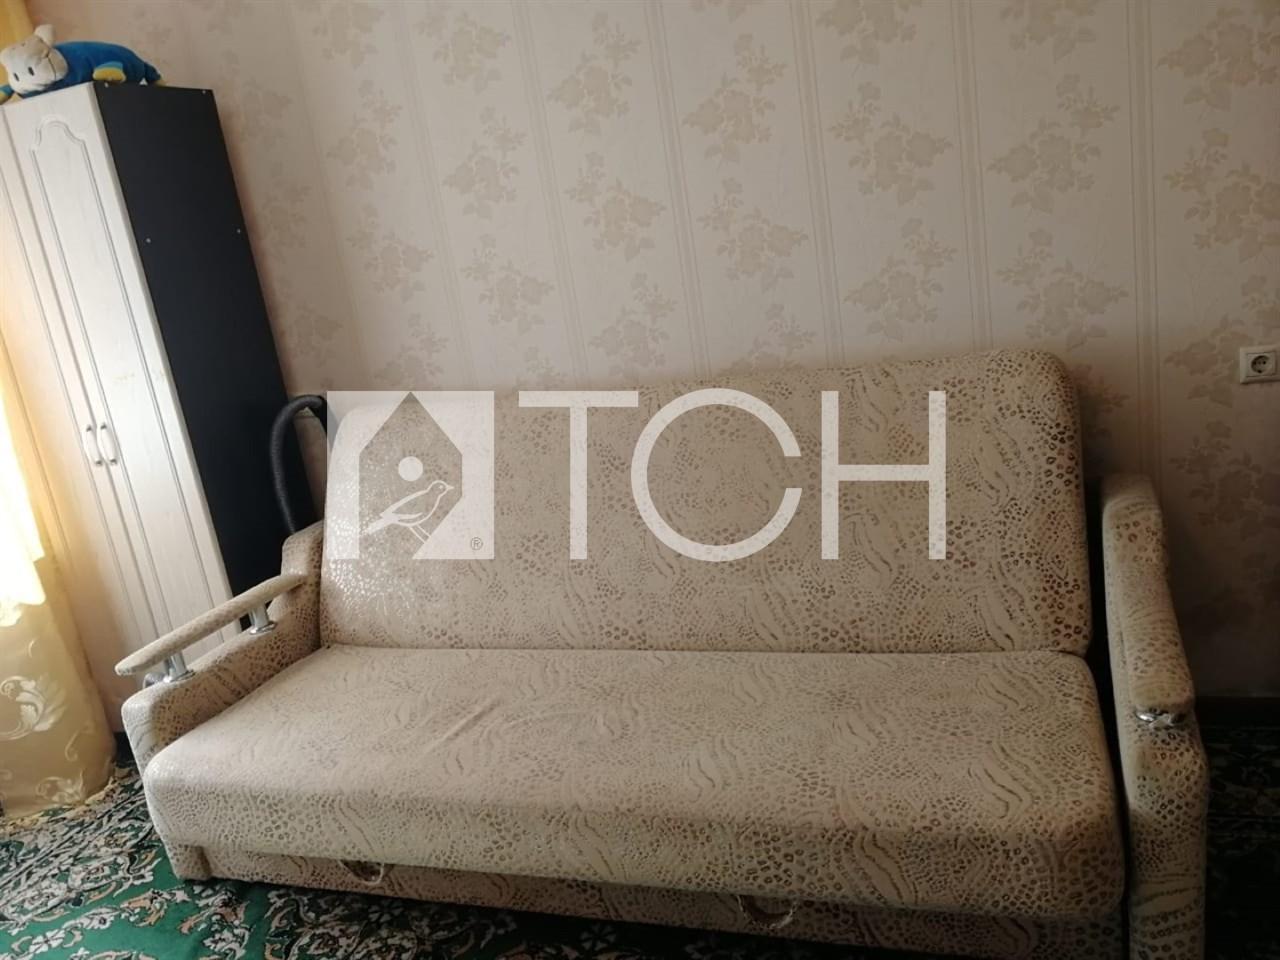 Квартира, 1 комната, 35 м² в Щелково 89261425000 купить 3